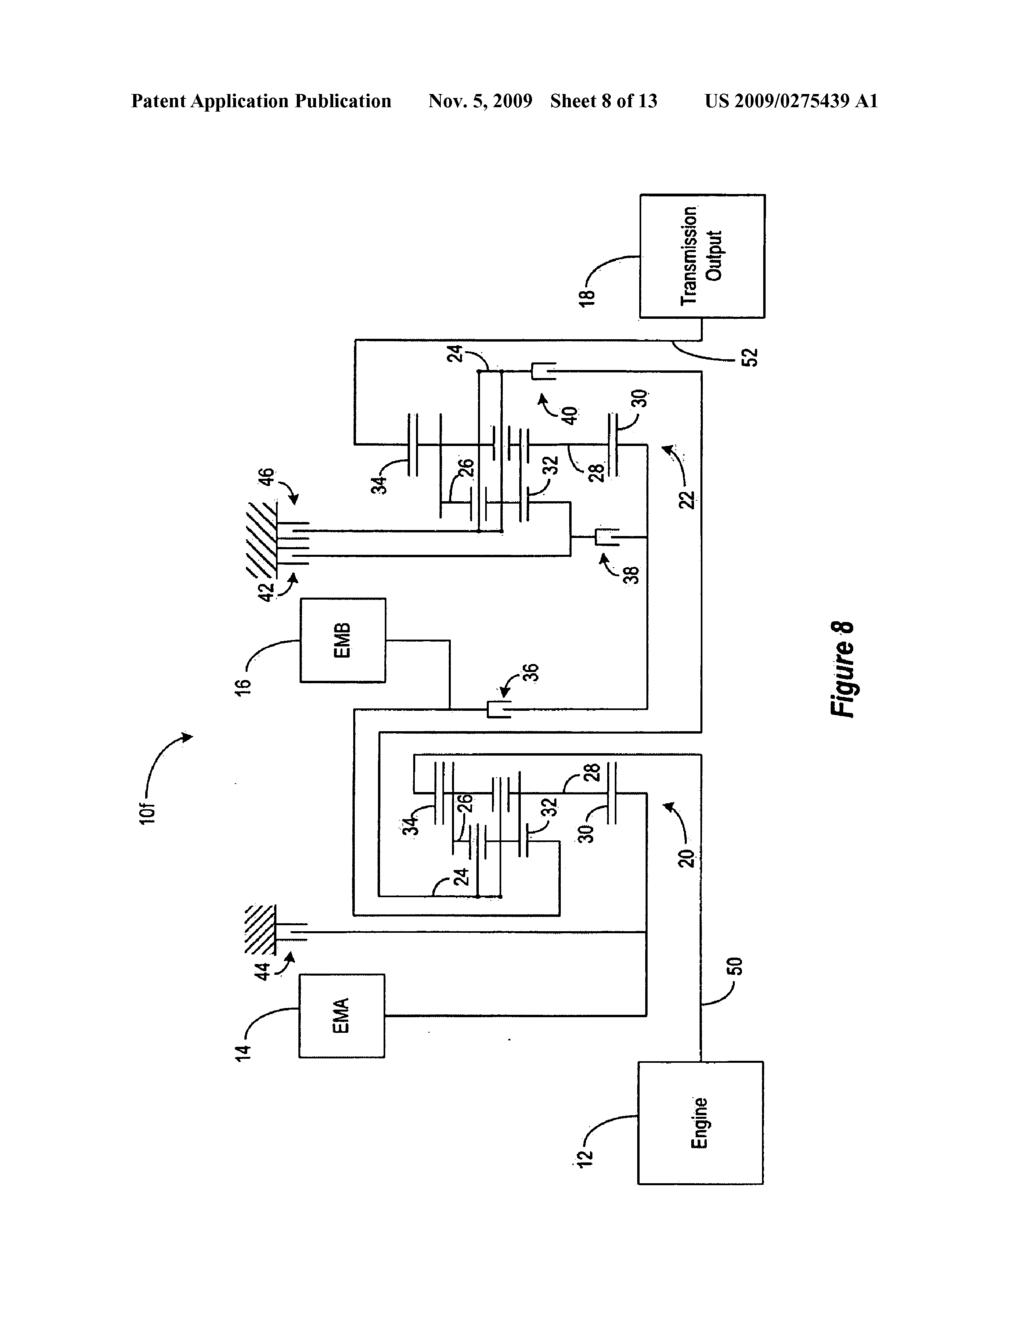 semi power split hybrid transmission with multiple modes and fixed rh patentsencyclopedia com Transmission Science Diagram Manual Transmission Diagram